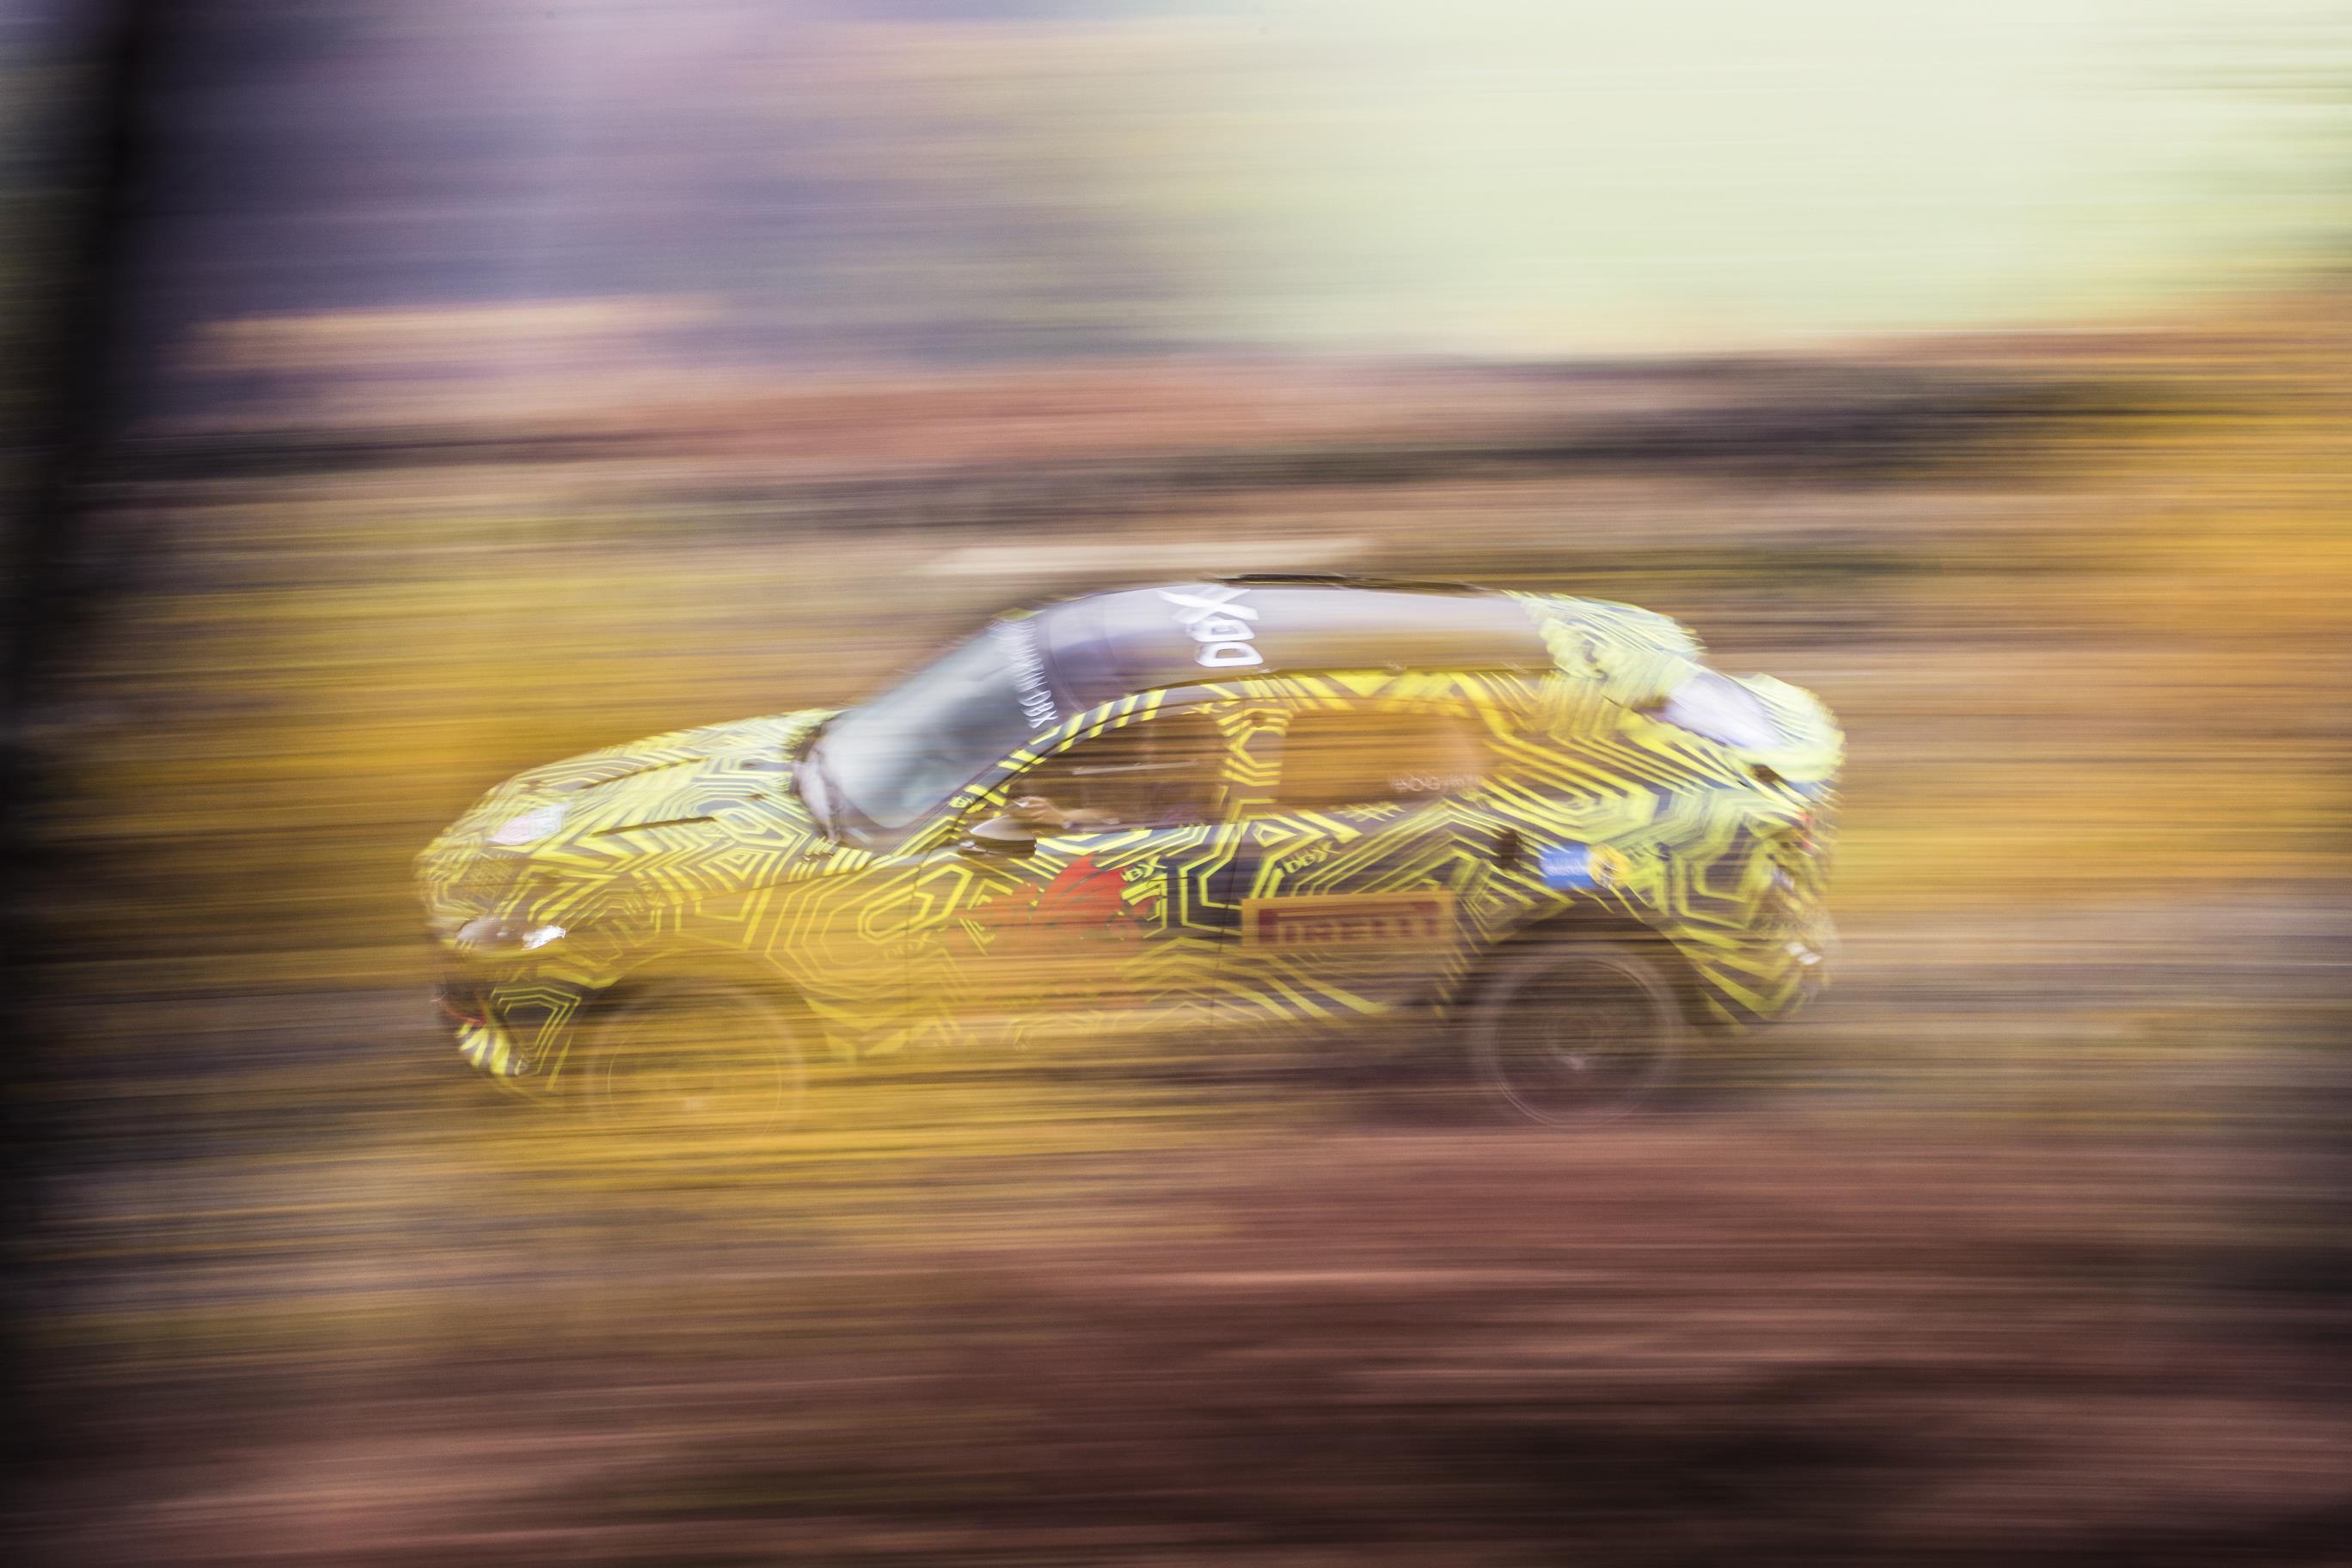 Aston Martin Dbx Wallpapers Wallpaper Cave